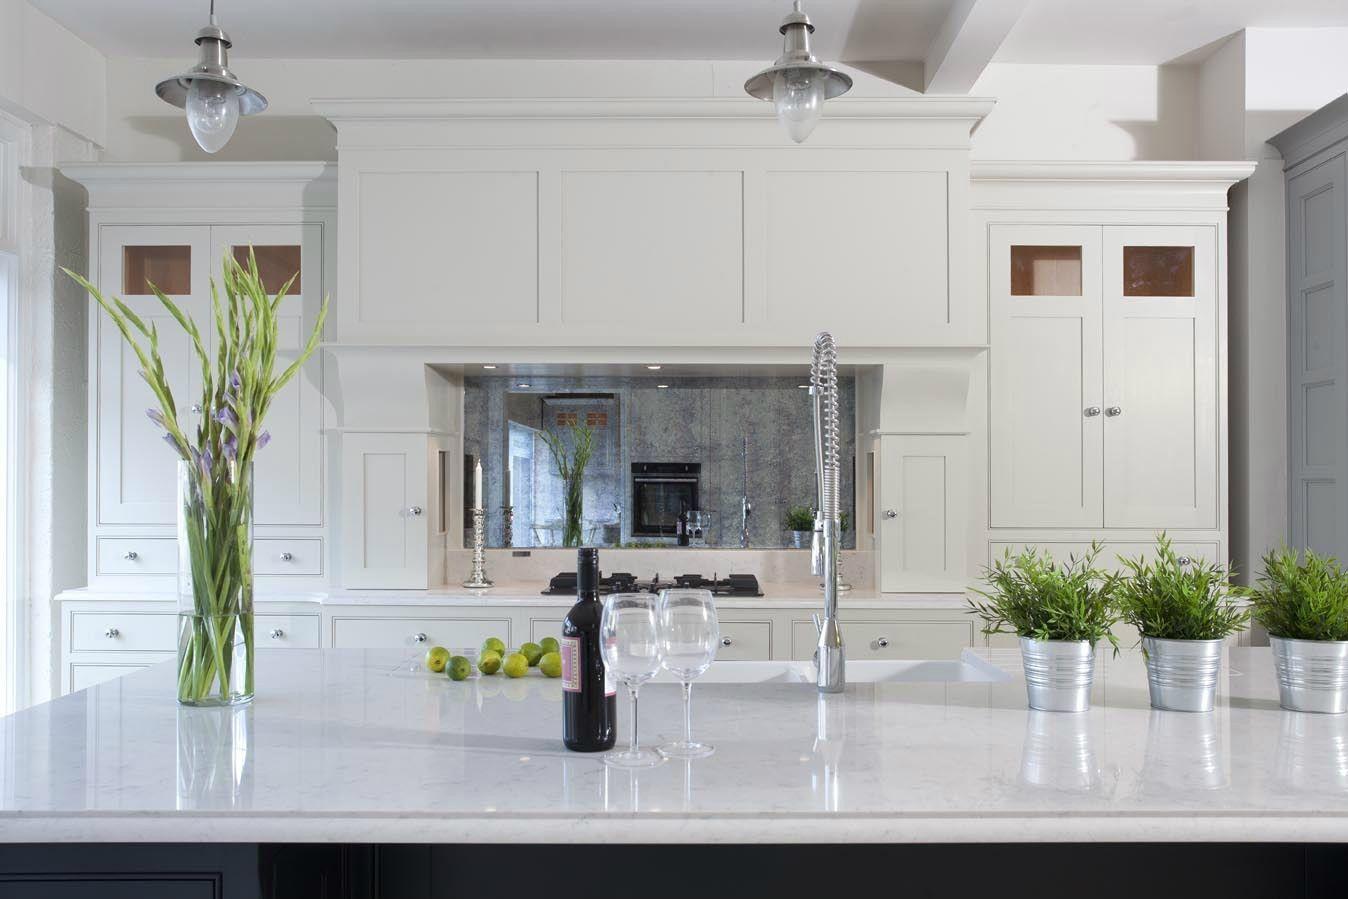 Silestone Lagoon Countertop in 2020 | Marble countertops ... on Modern Kitchen Countertop Decor  id=44748